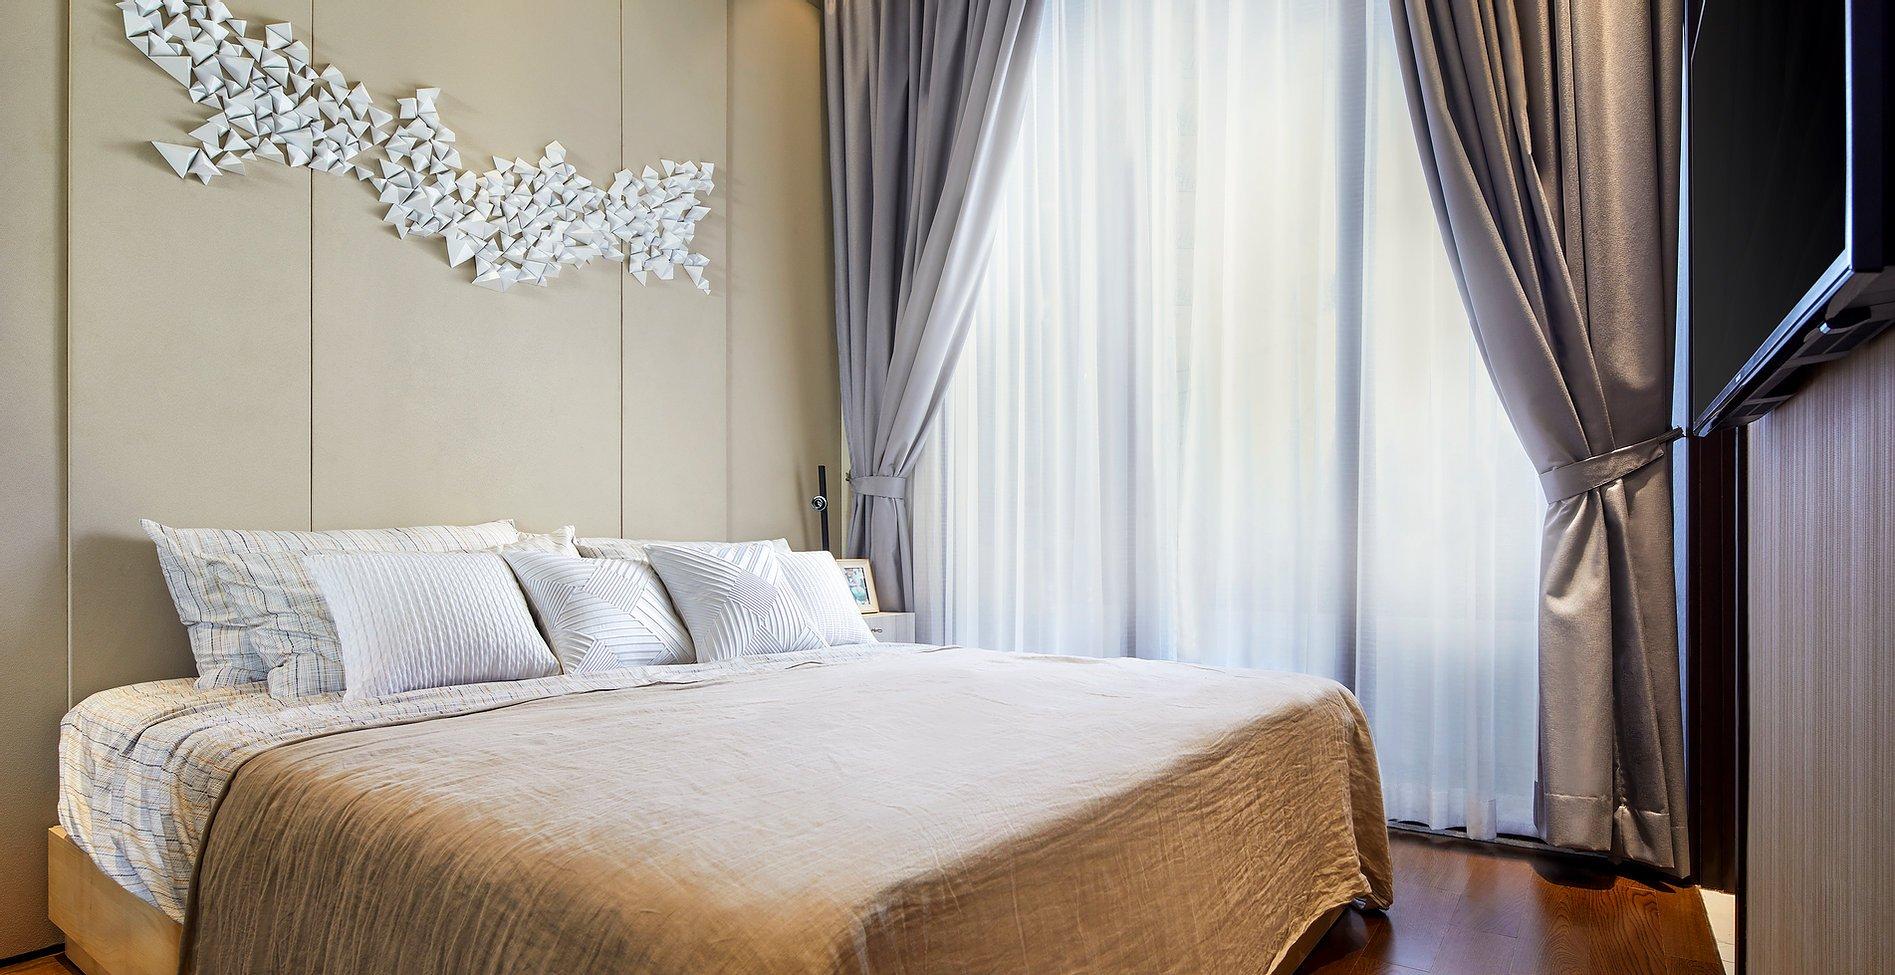 Lavon Swan City tipe B Master Bedroom